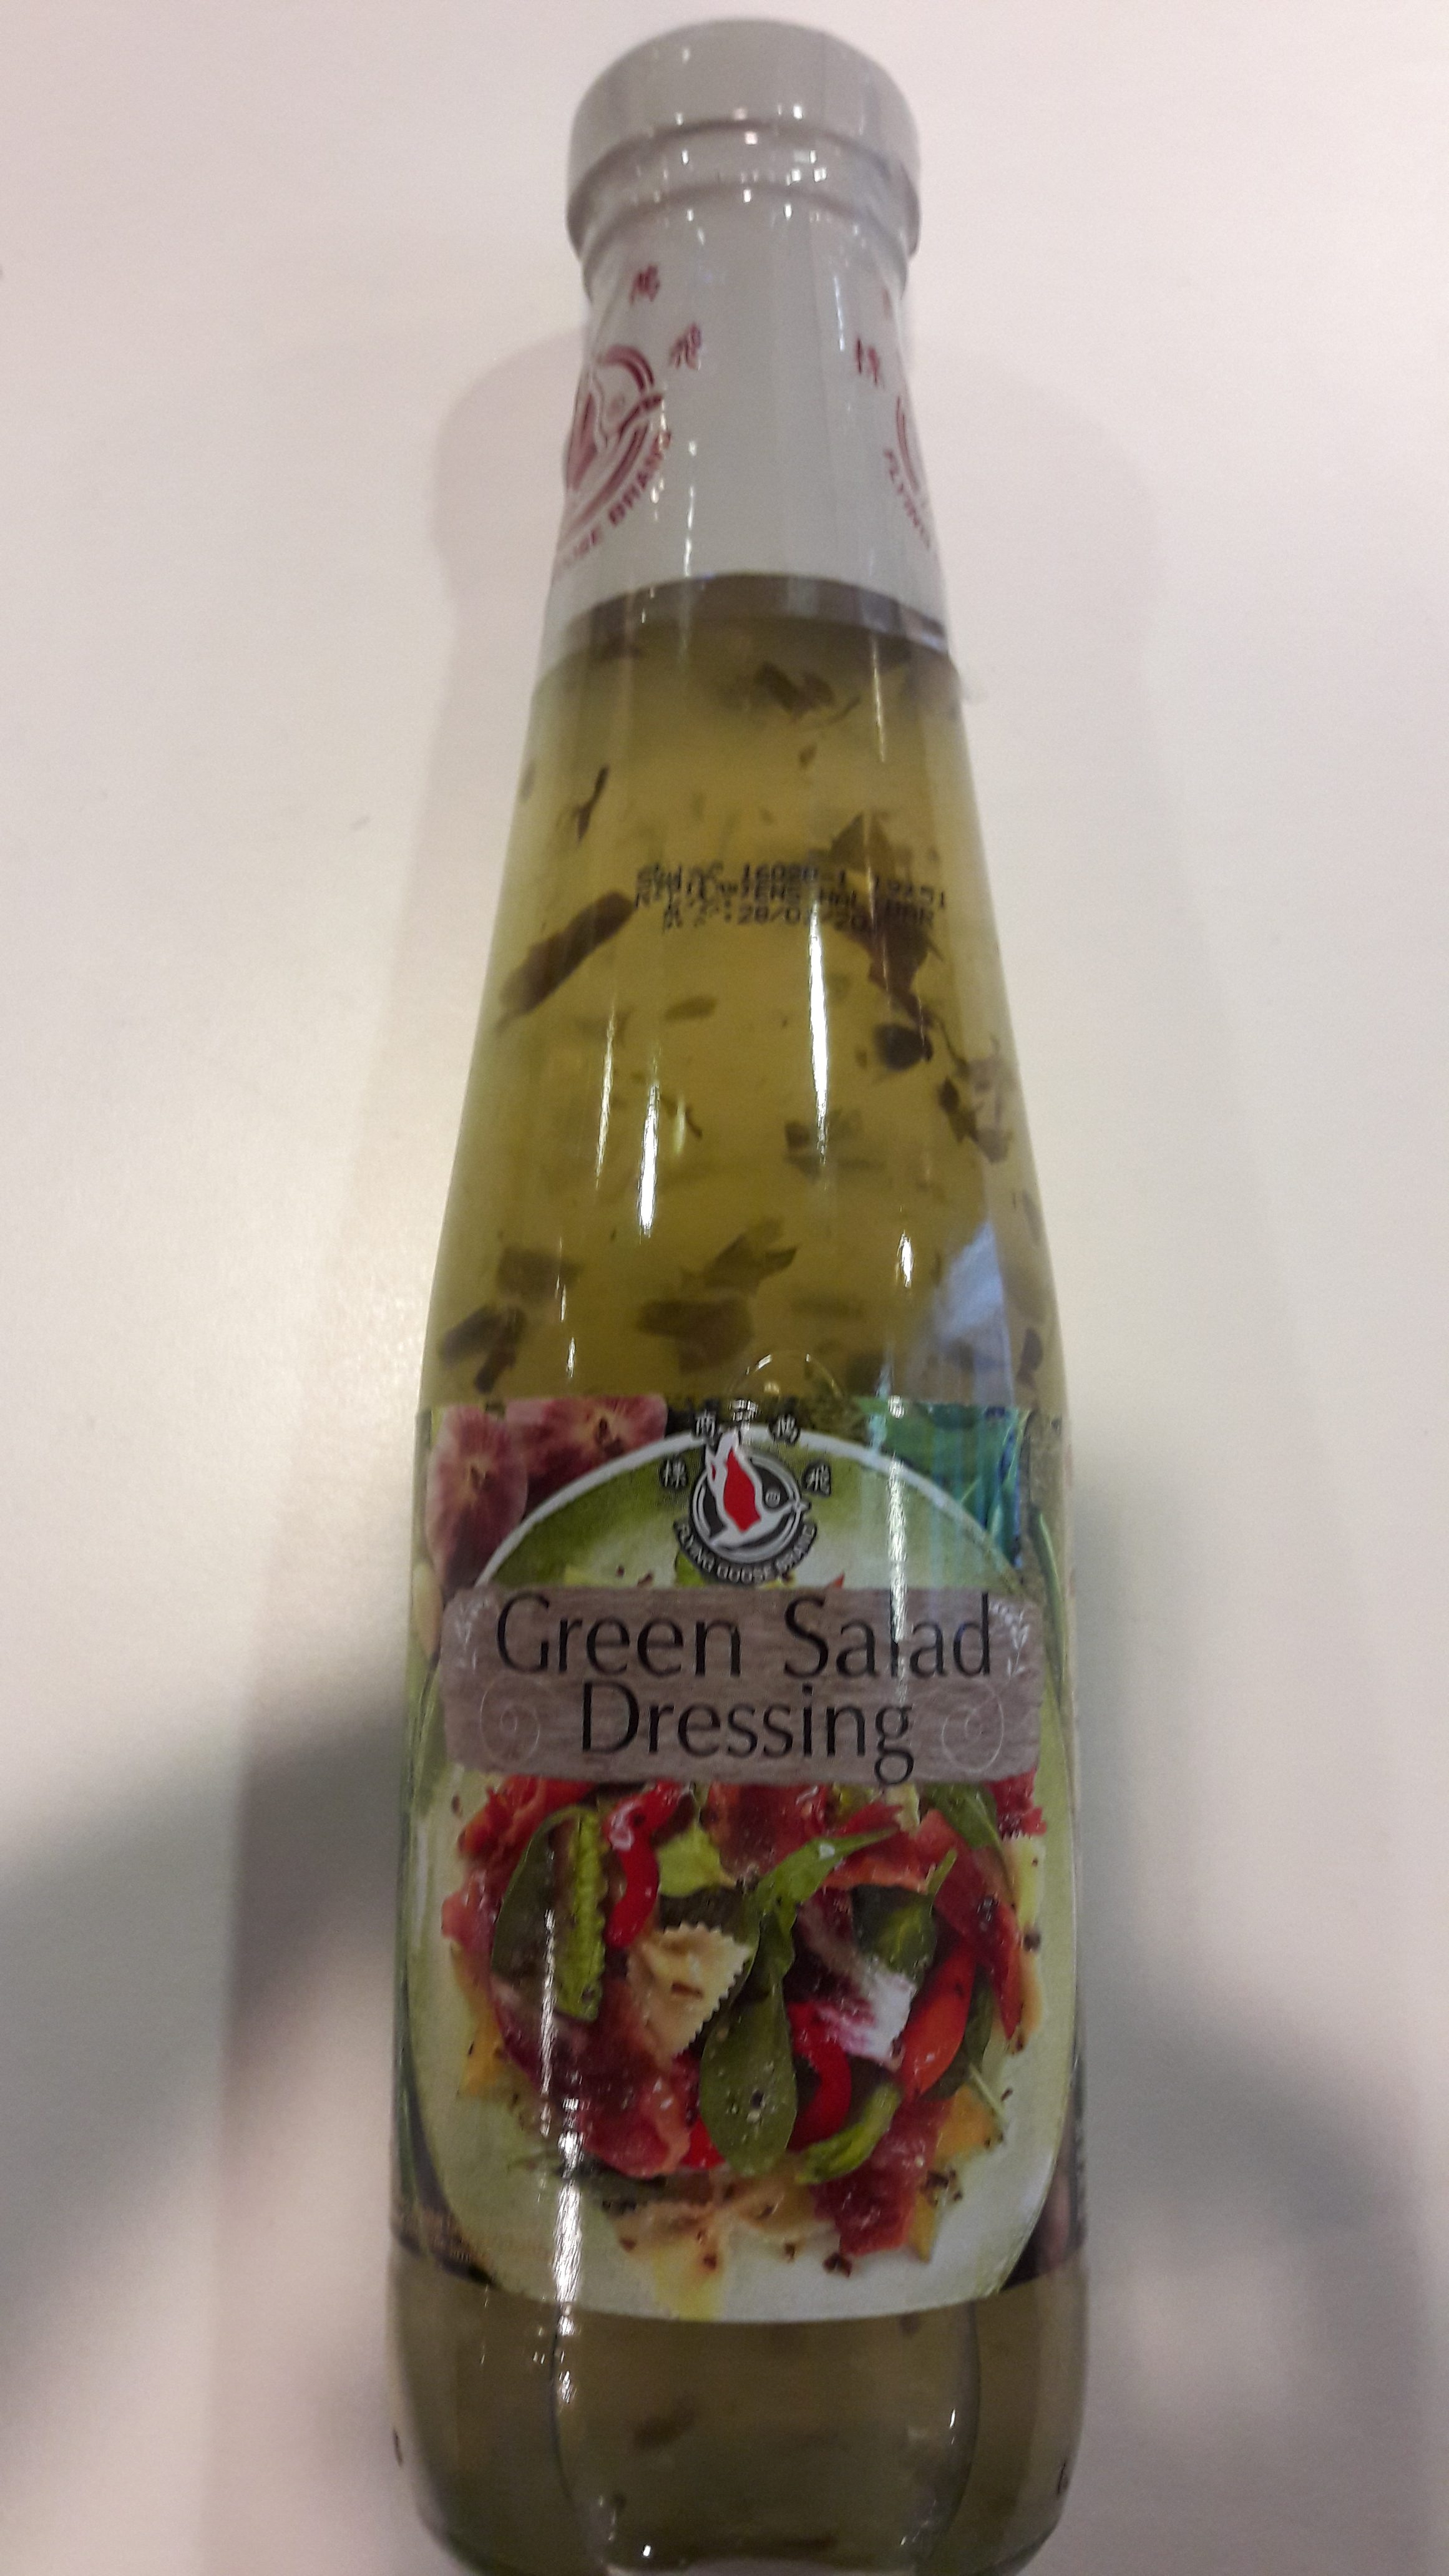 Green Salad Dressing Image